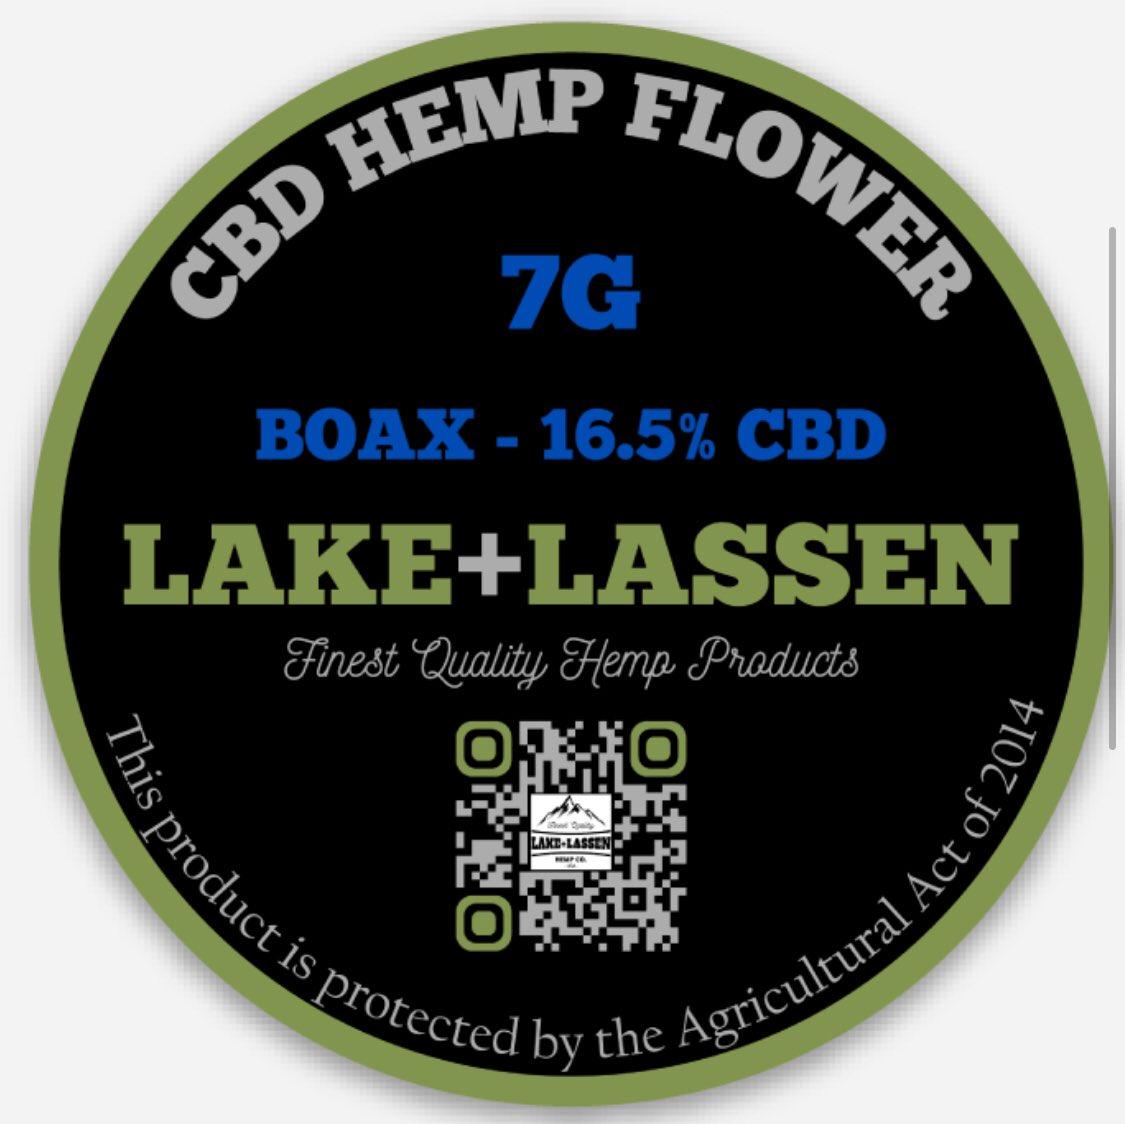 Lake and Lassen Hemp Co on Twitter: